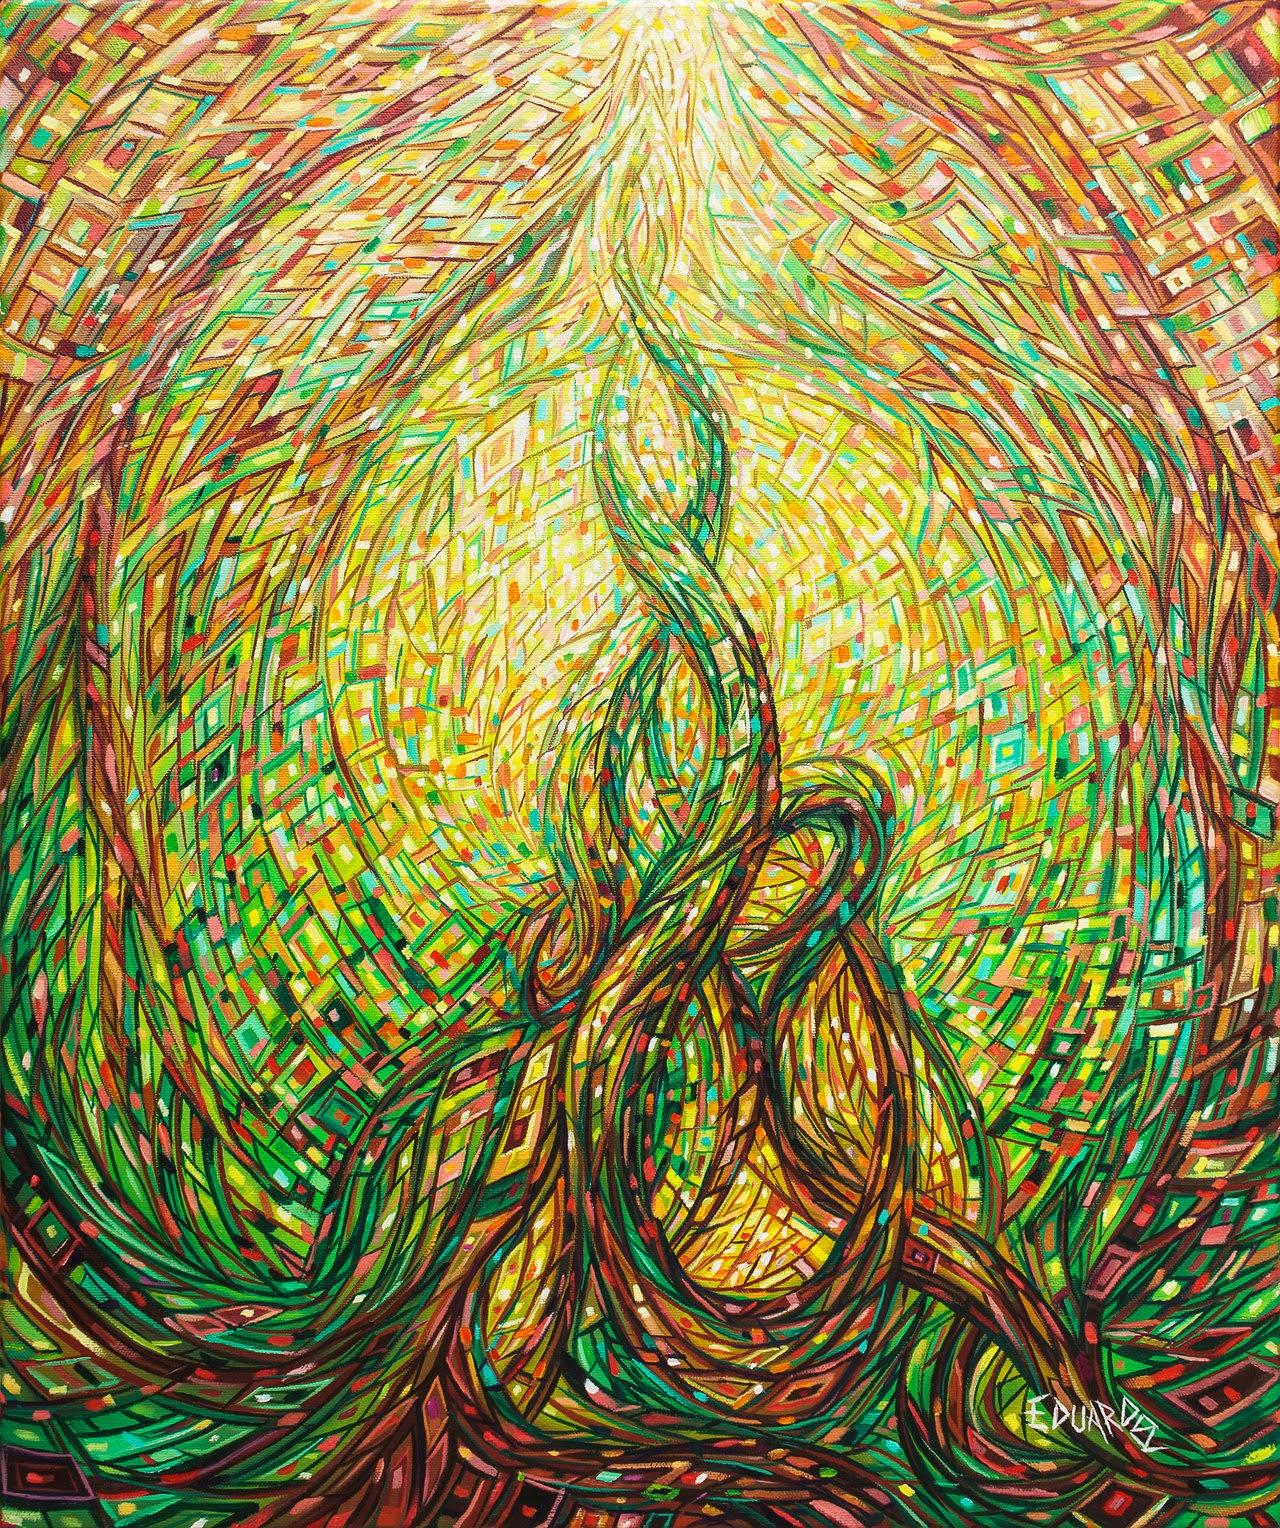 09-Seed-Eduardo-R-Calzado-Paintings-in-Swirls-of-Colour-www-designstack-co